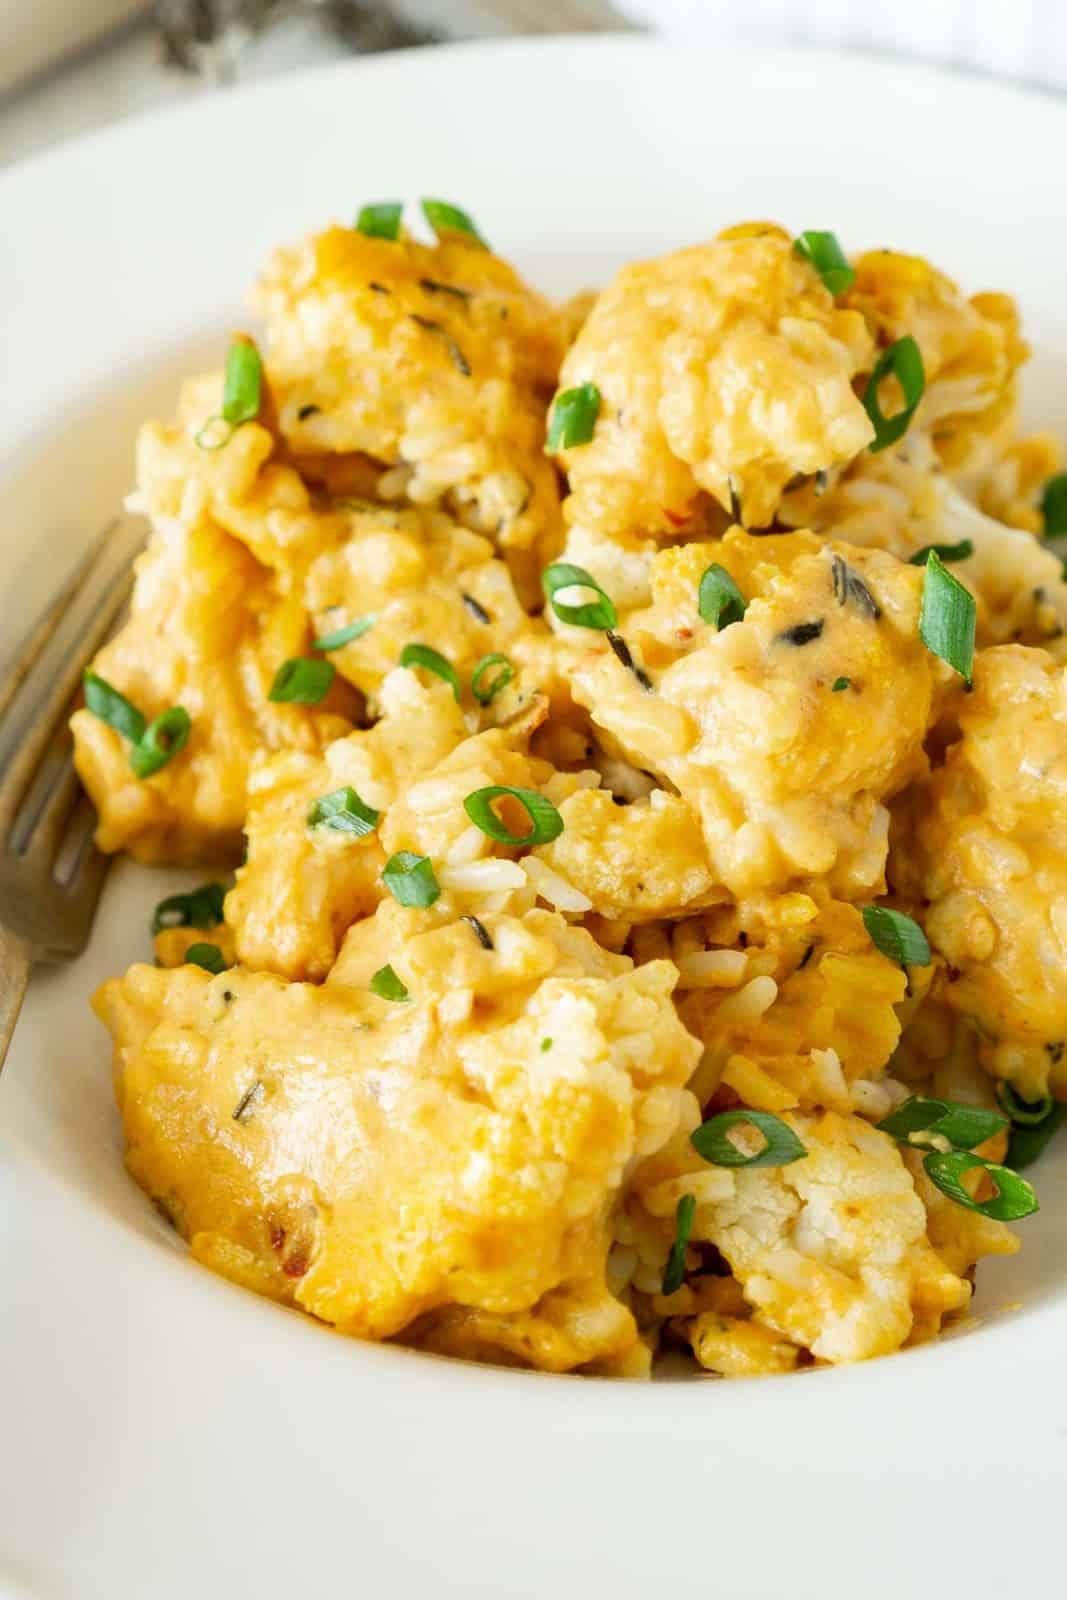 vegan cheesy cauliflower casserole on a plate